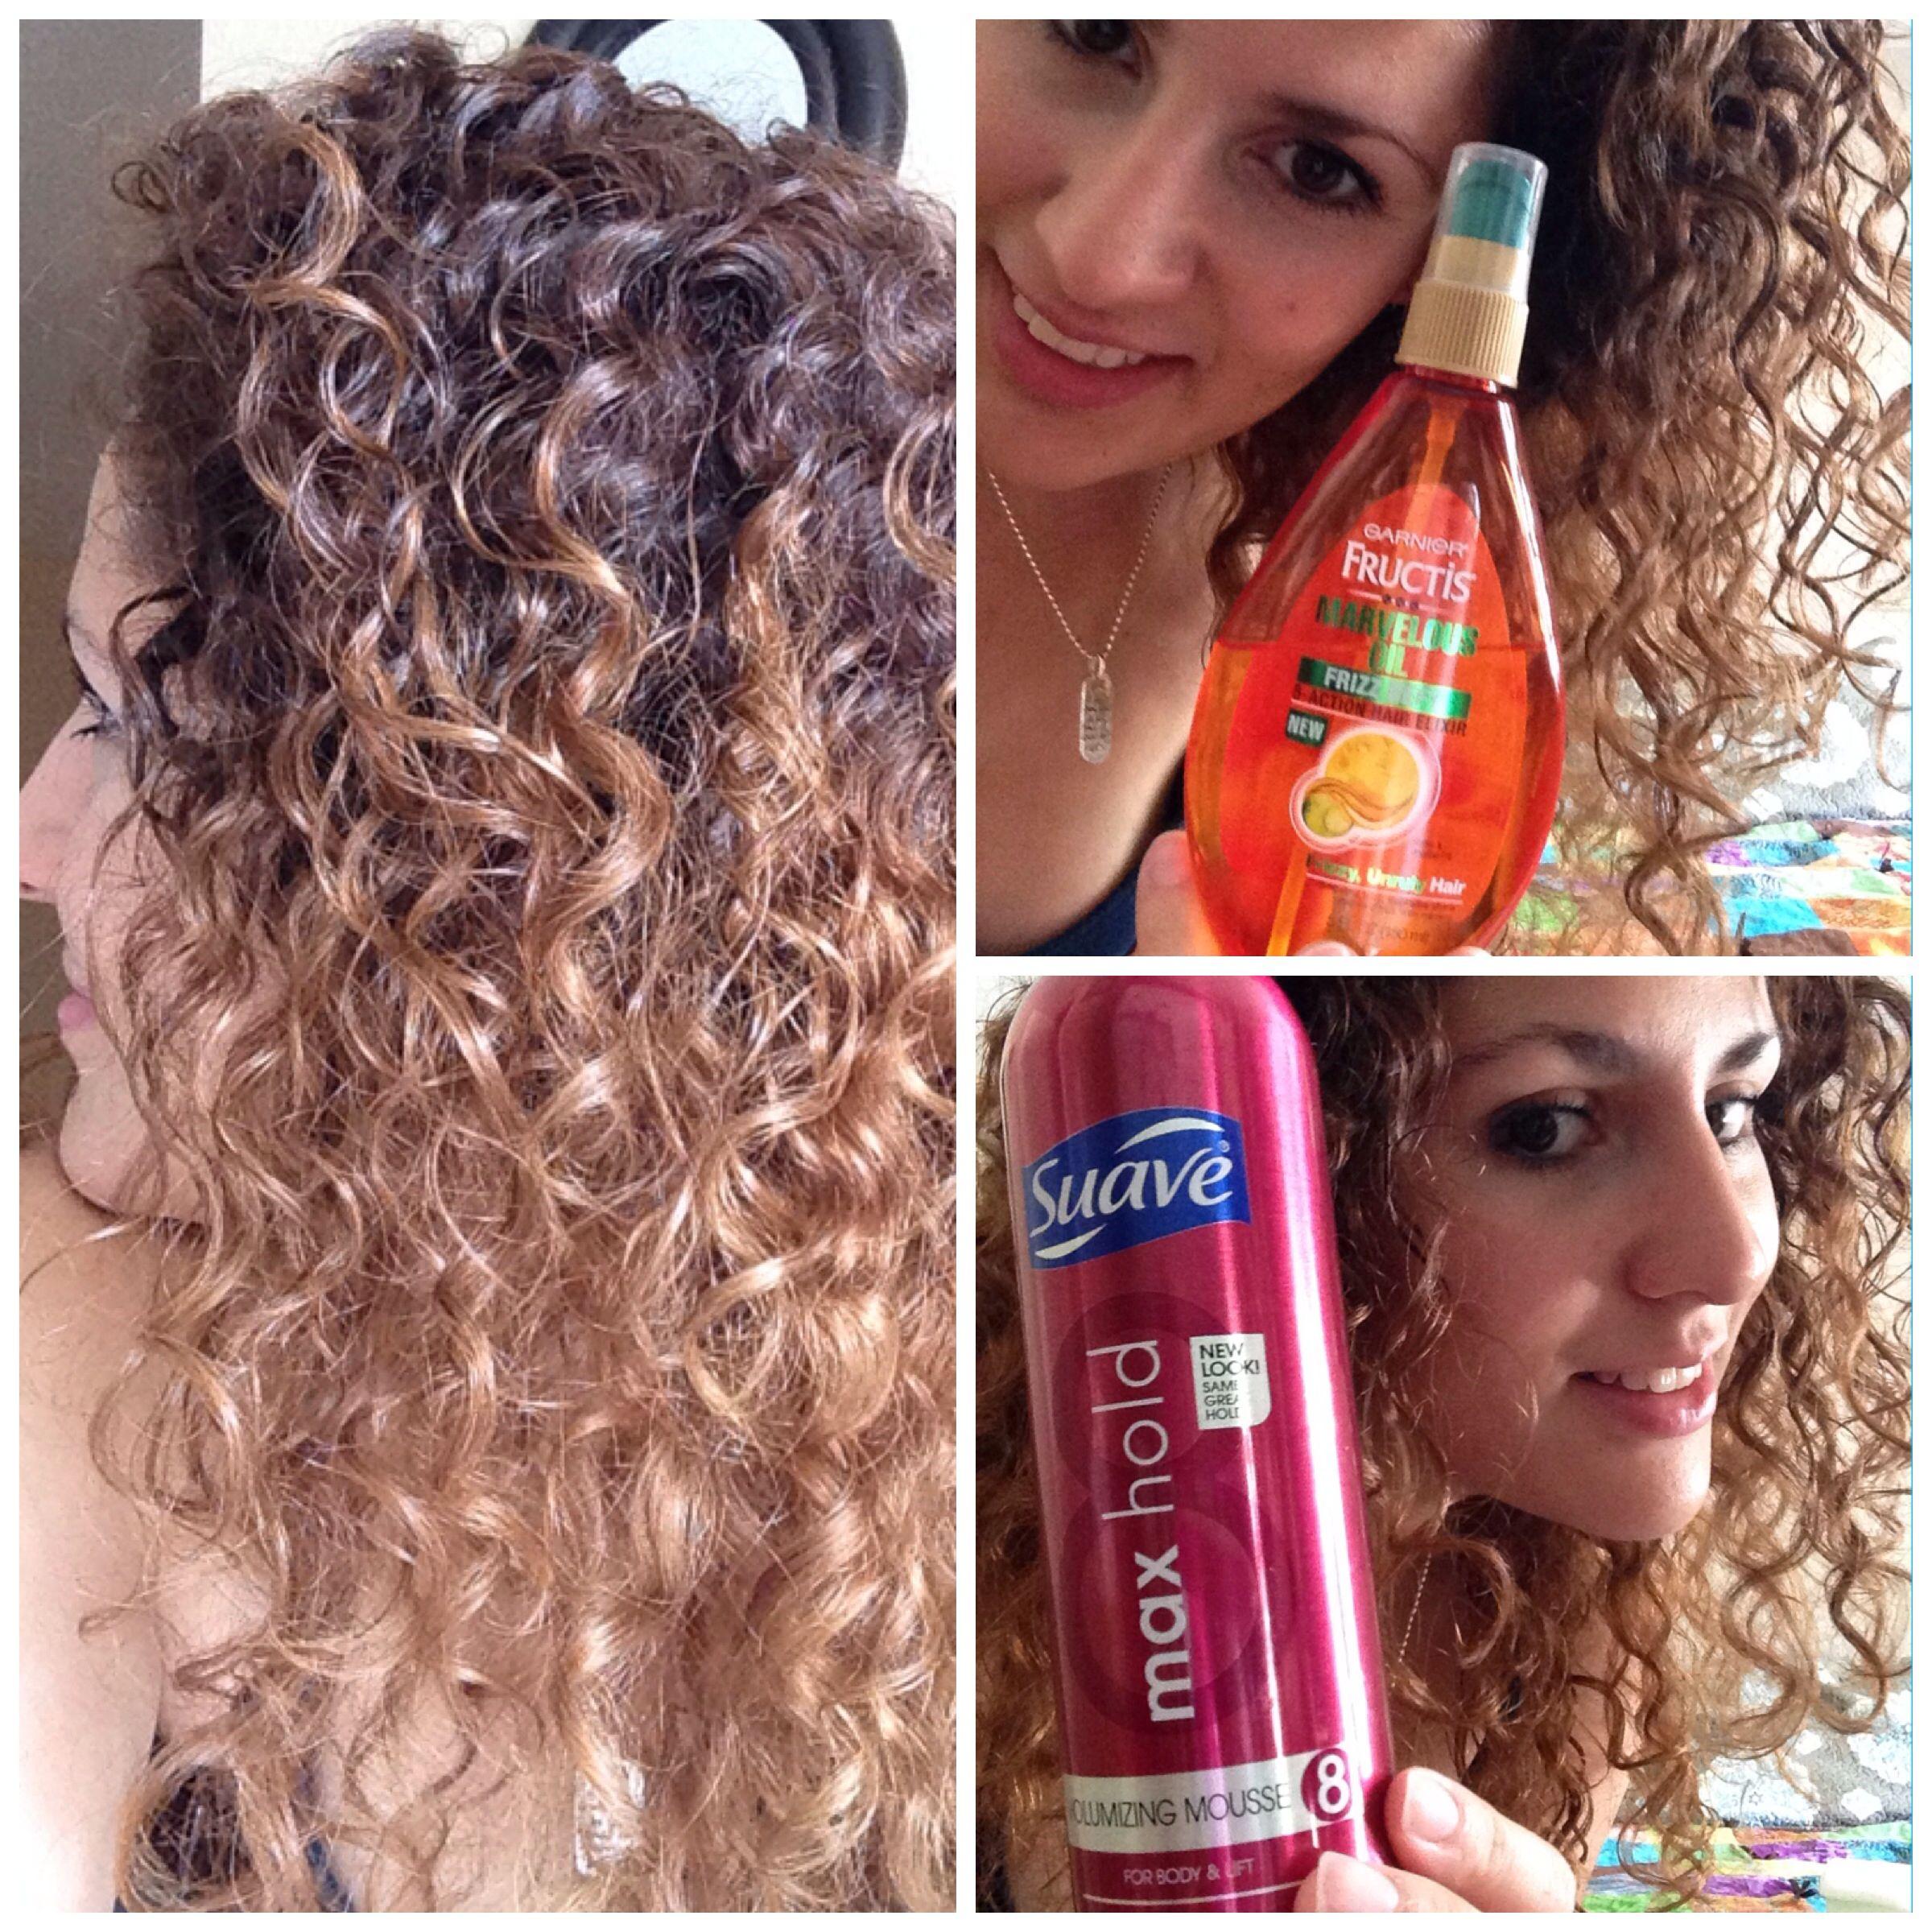 Cabello Rizado Natural Naturally Curly Hair Para Cuidar Nuestro